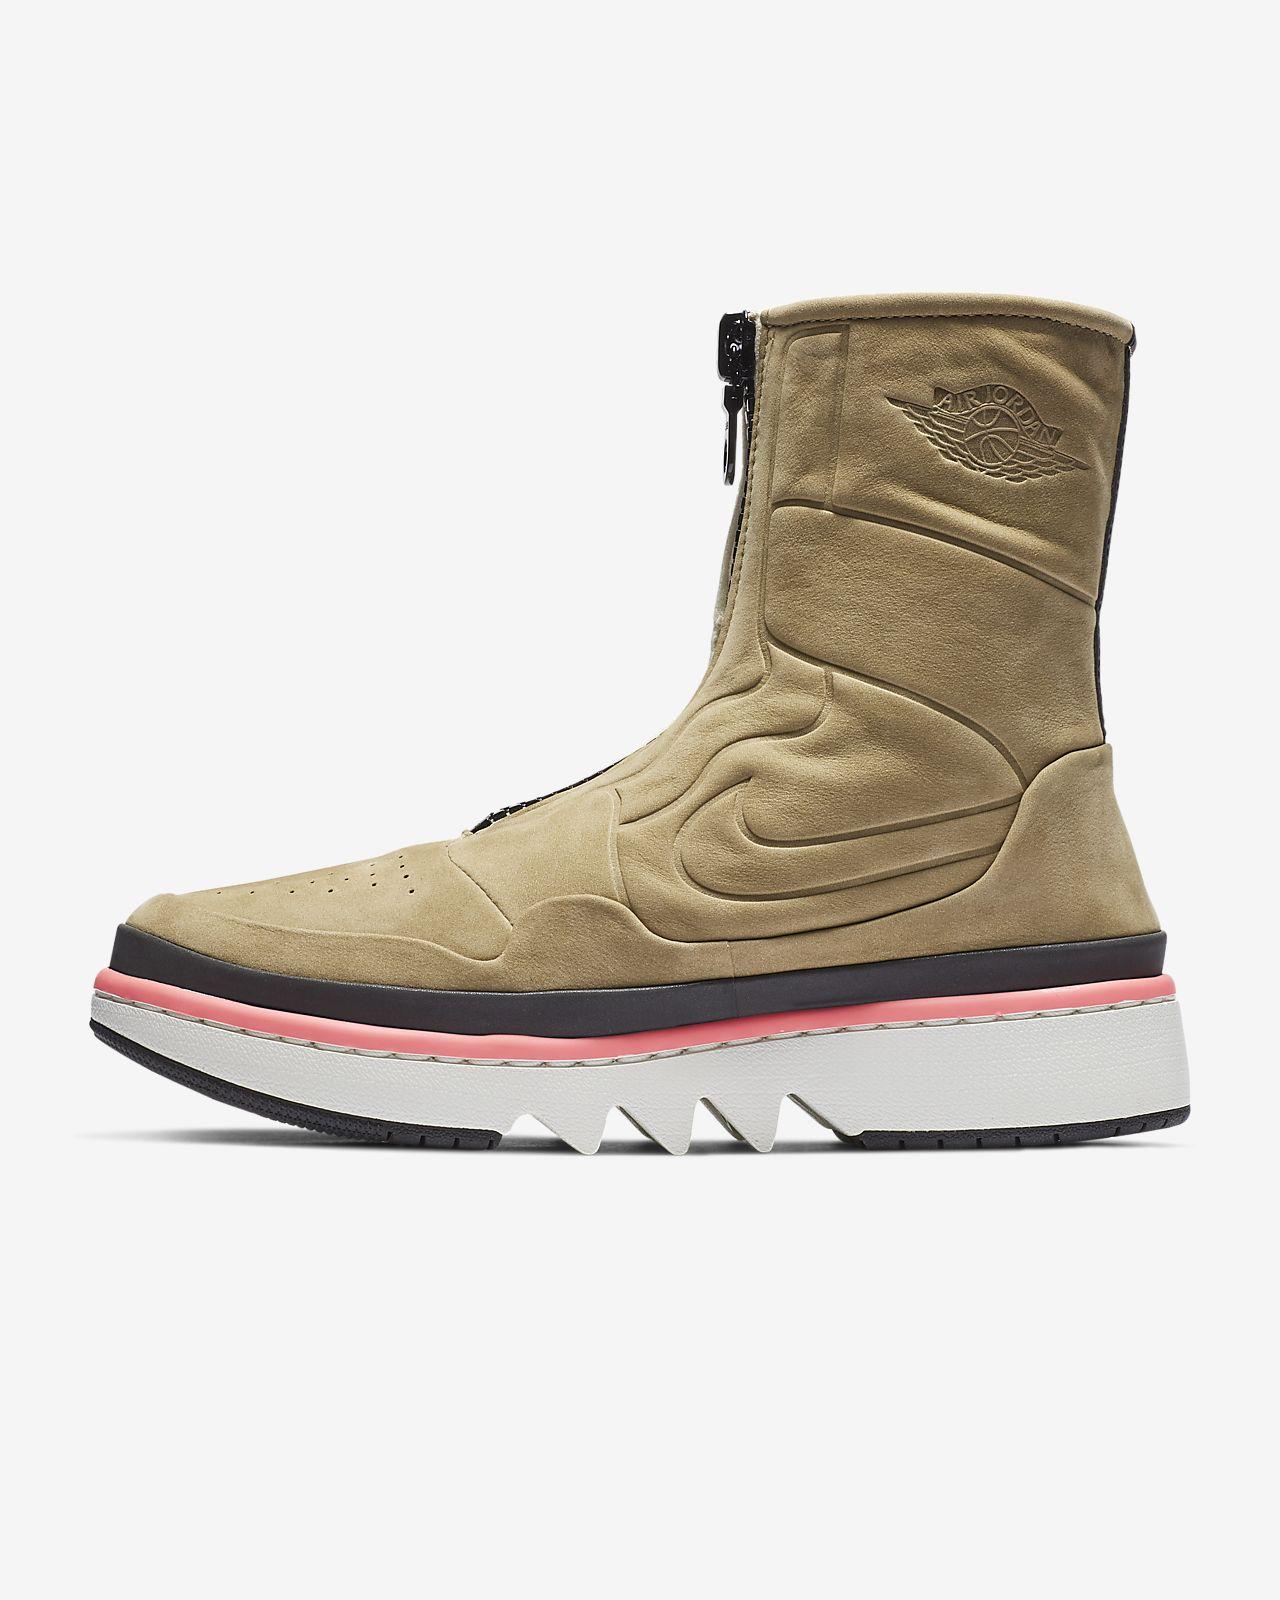 brand new 19c3c bcd87 Calzado para mujer Air Jordan 1 Jester XX Utility Pack